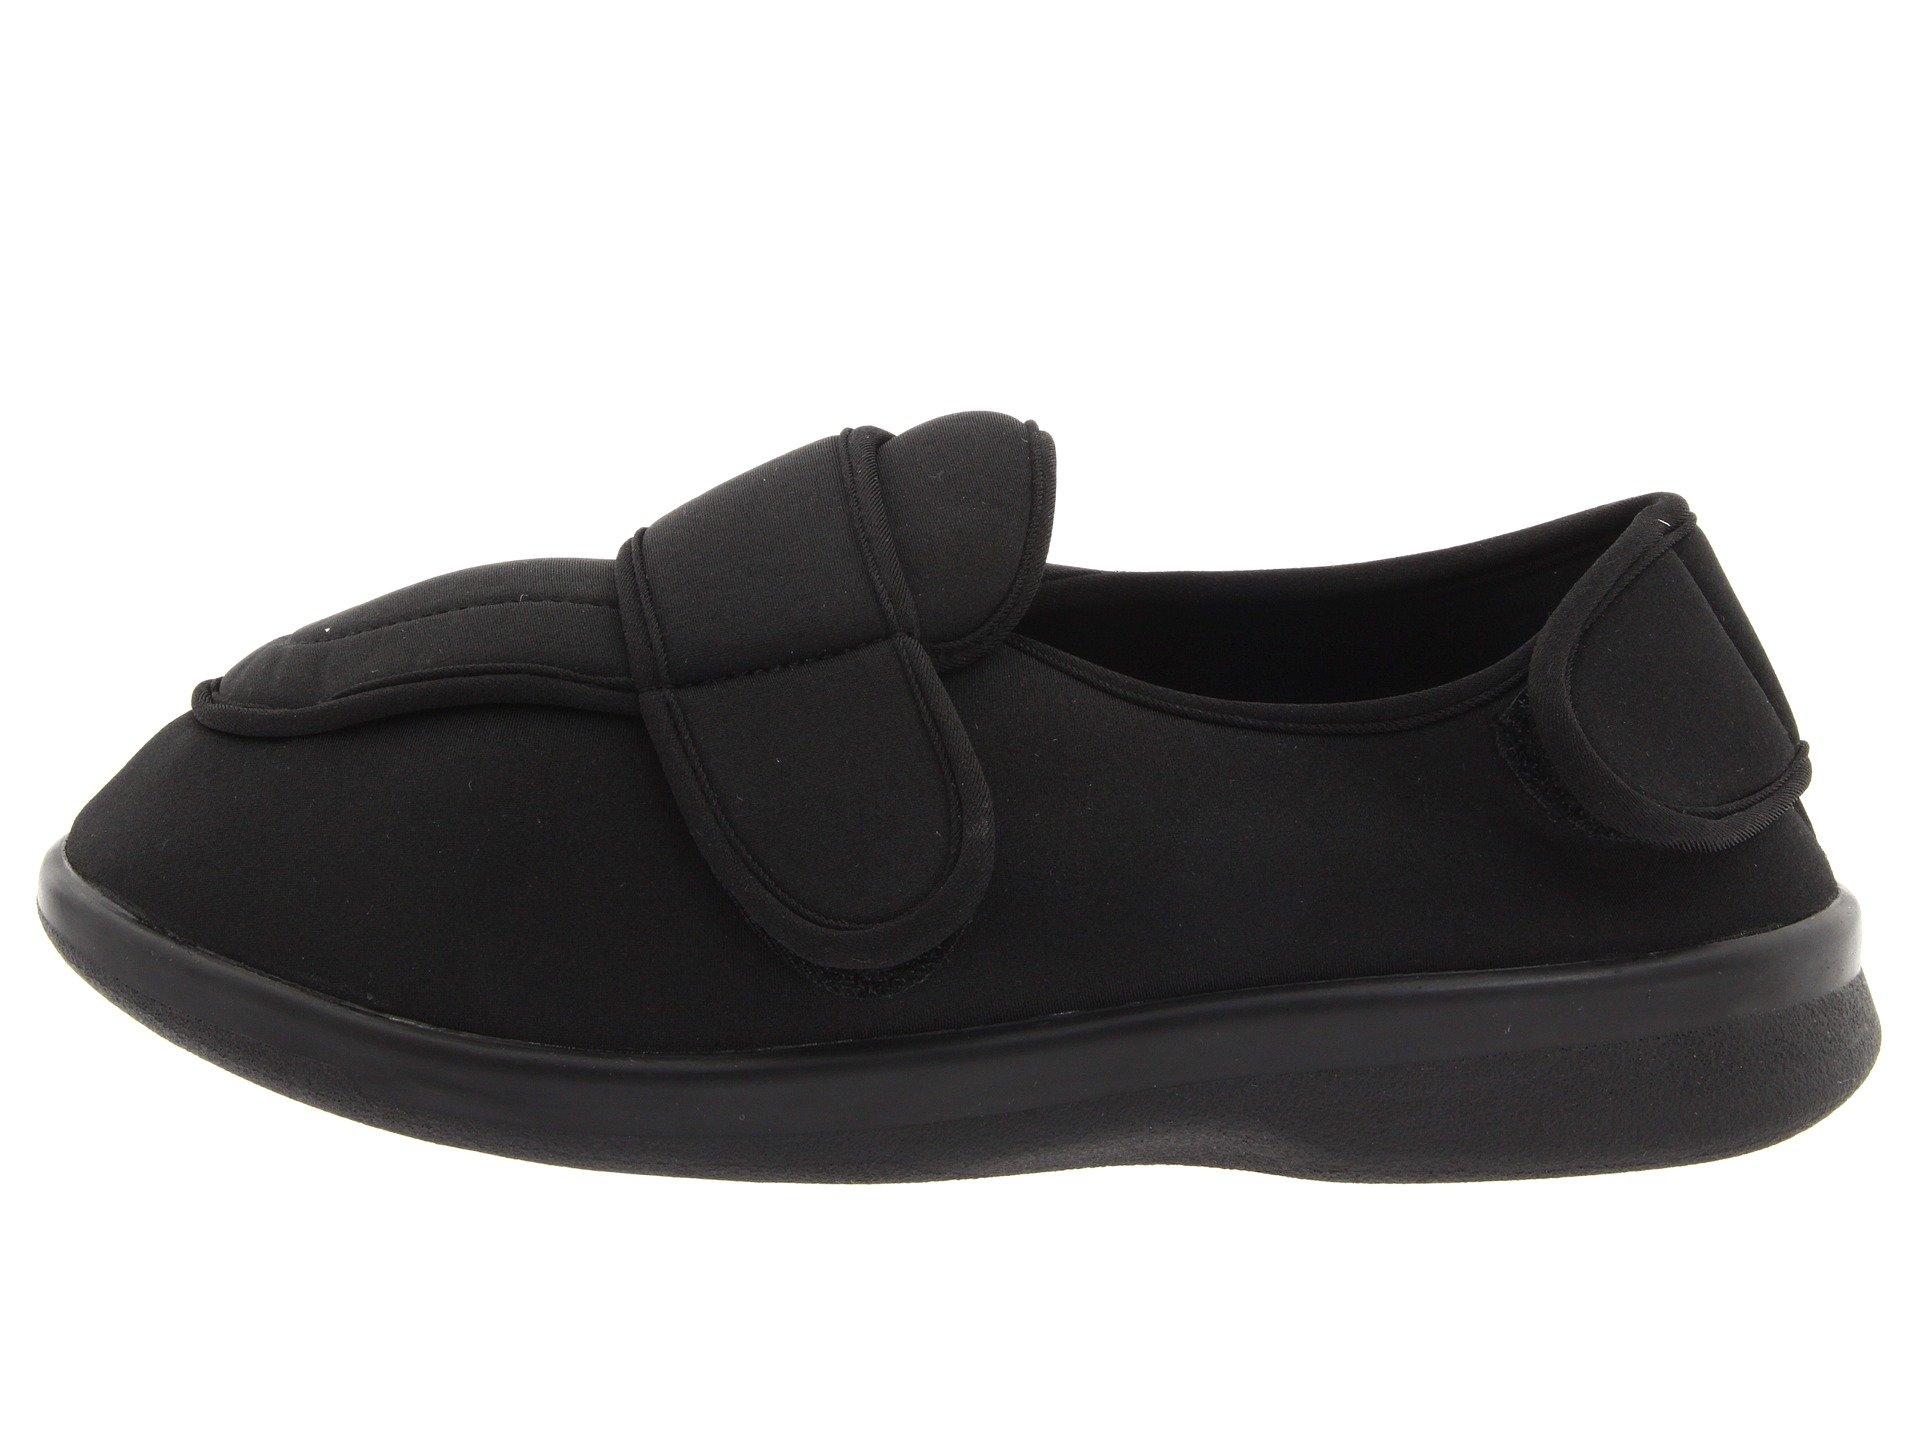 A5500 Propet Shoe Black Cronus Diabetic hcpcs Code Medicare qxn4pIZwBO